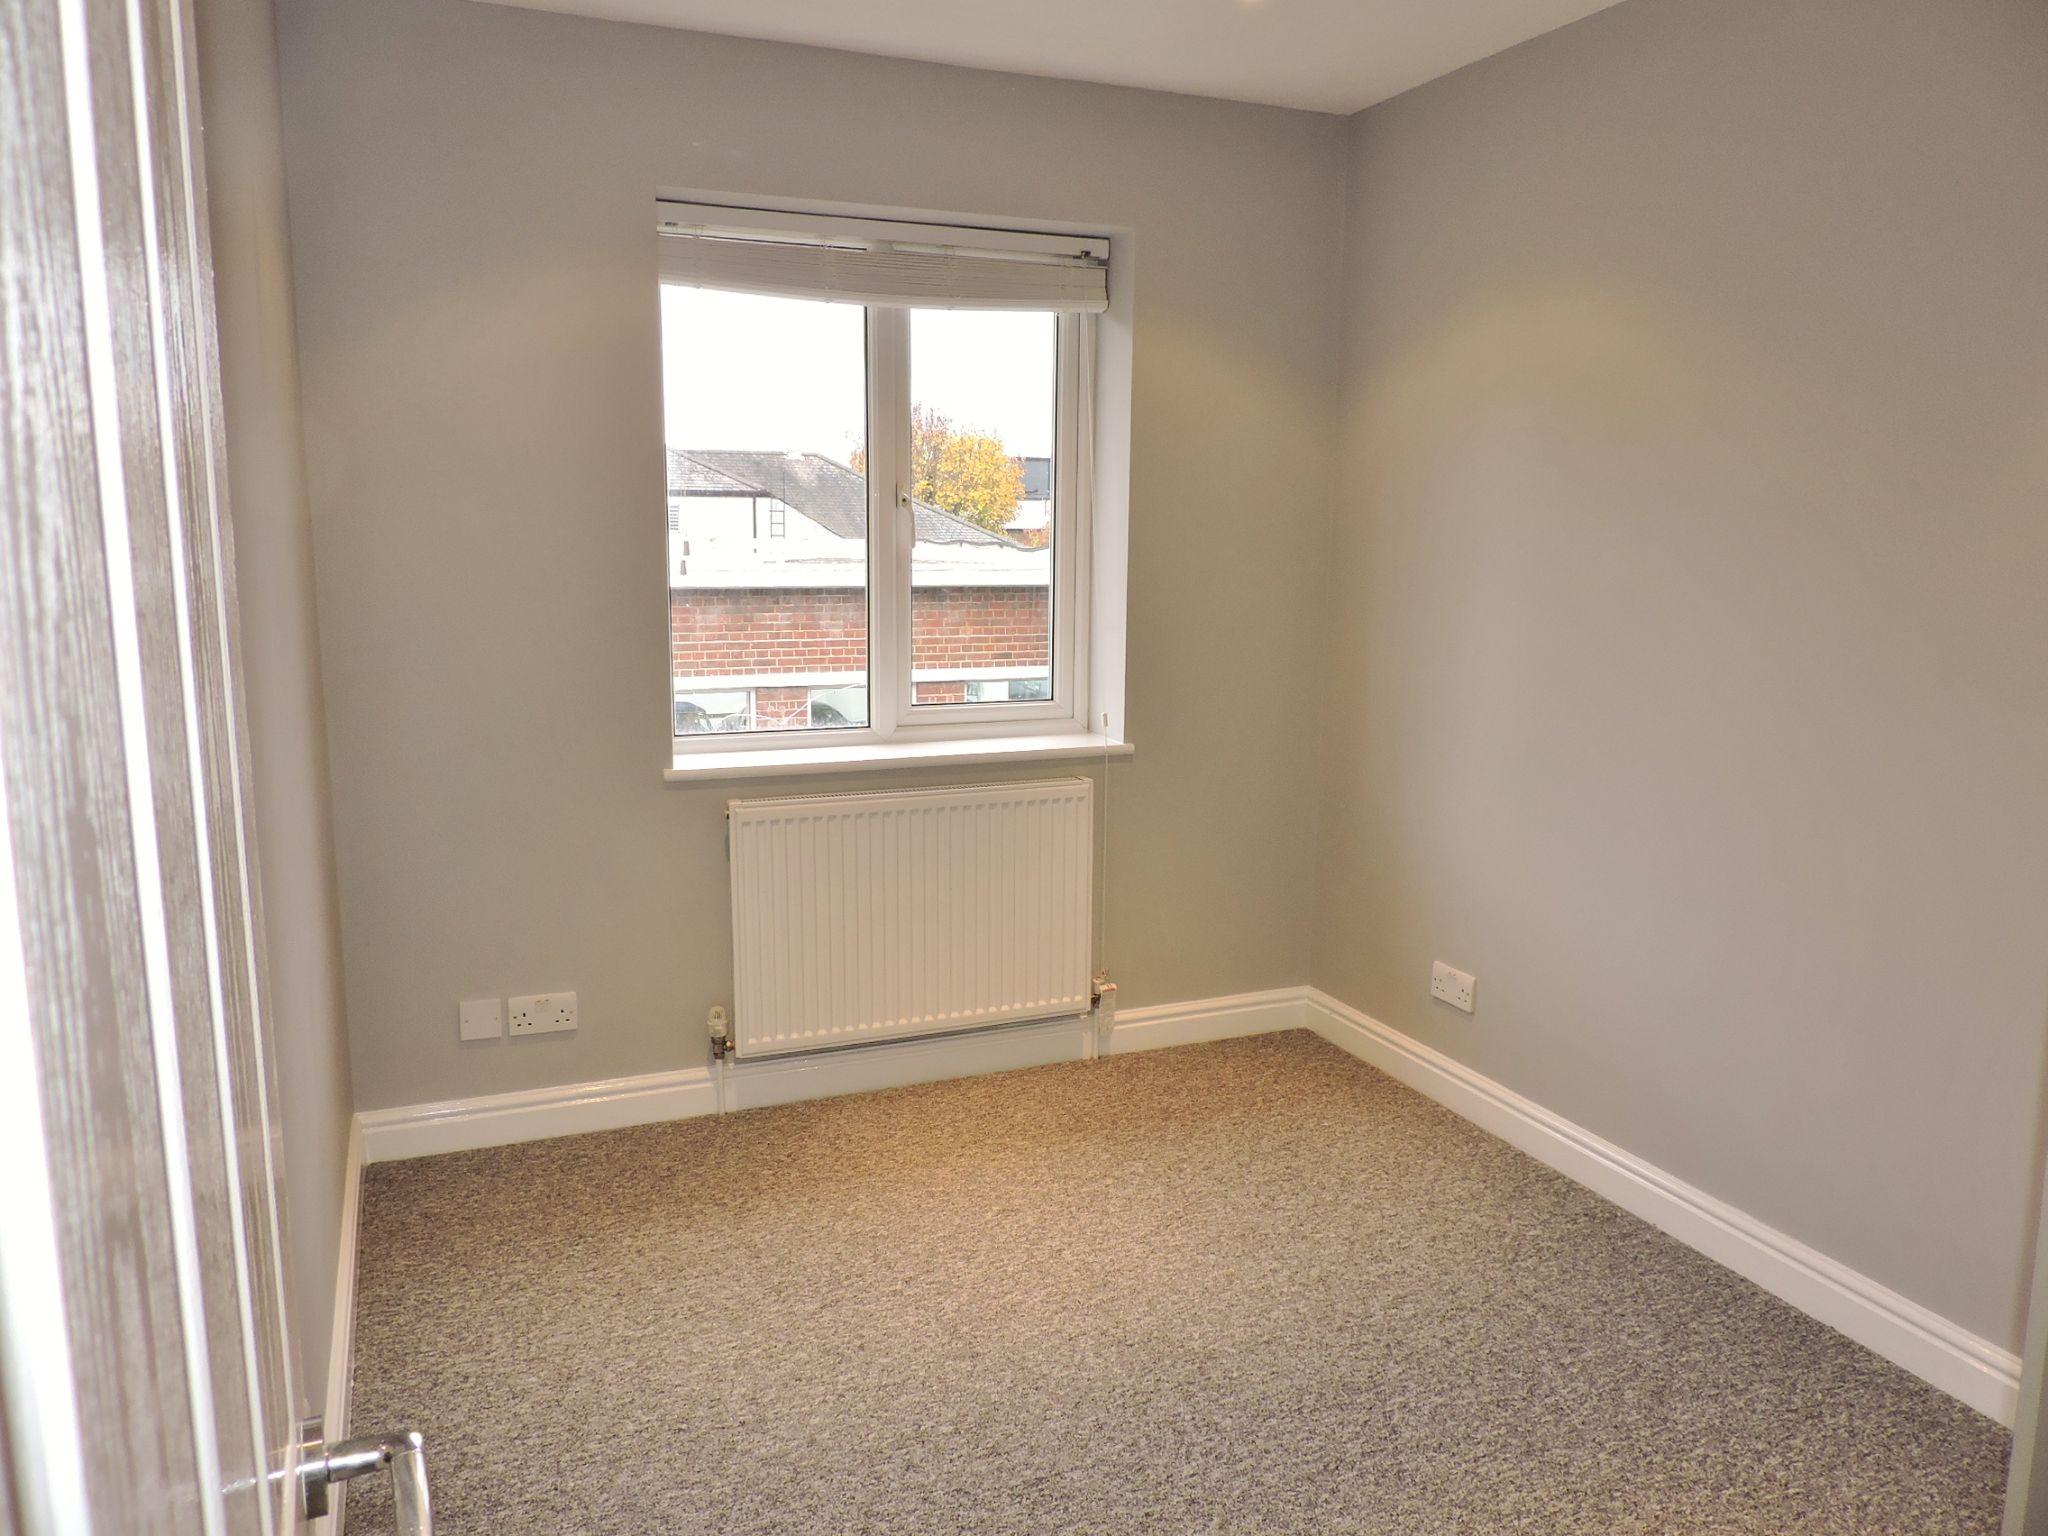 1 bedroom maisonette flat/apartment Let in Cobham - Photograph 5